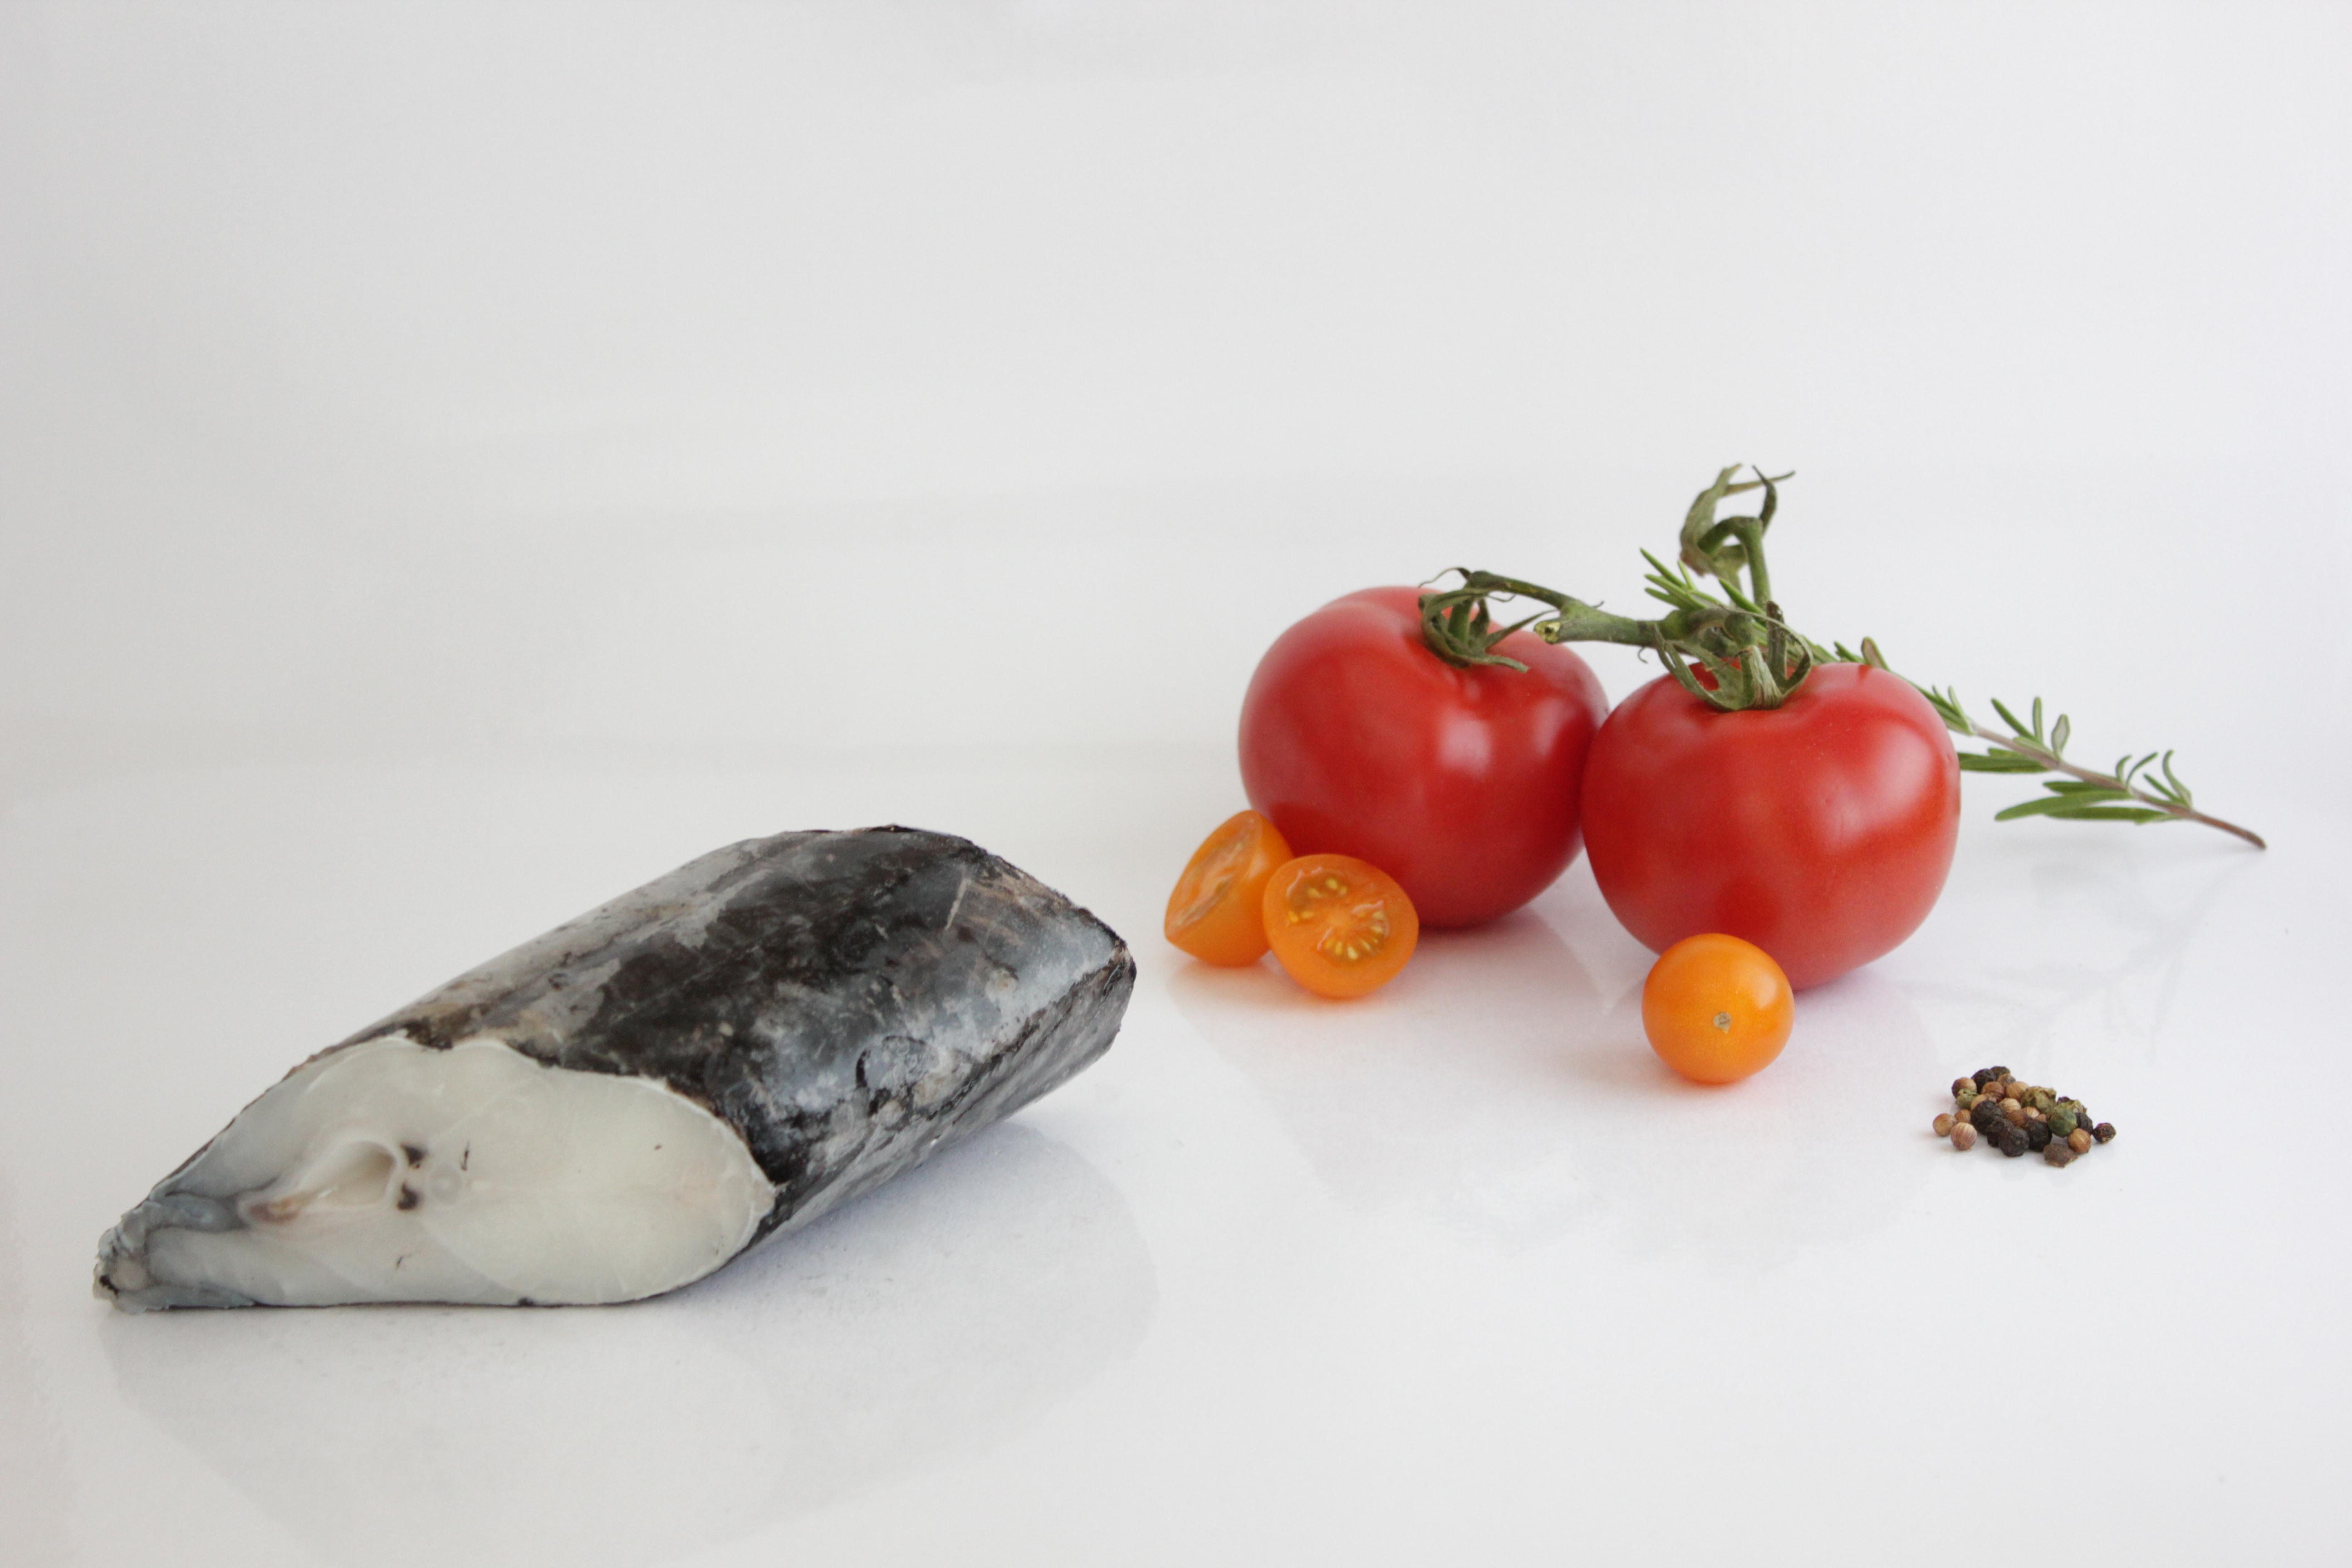 Peixe Espada Preto | Black Scabbardfish